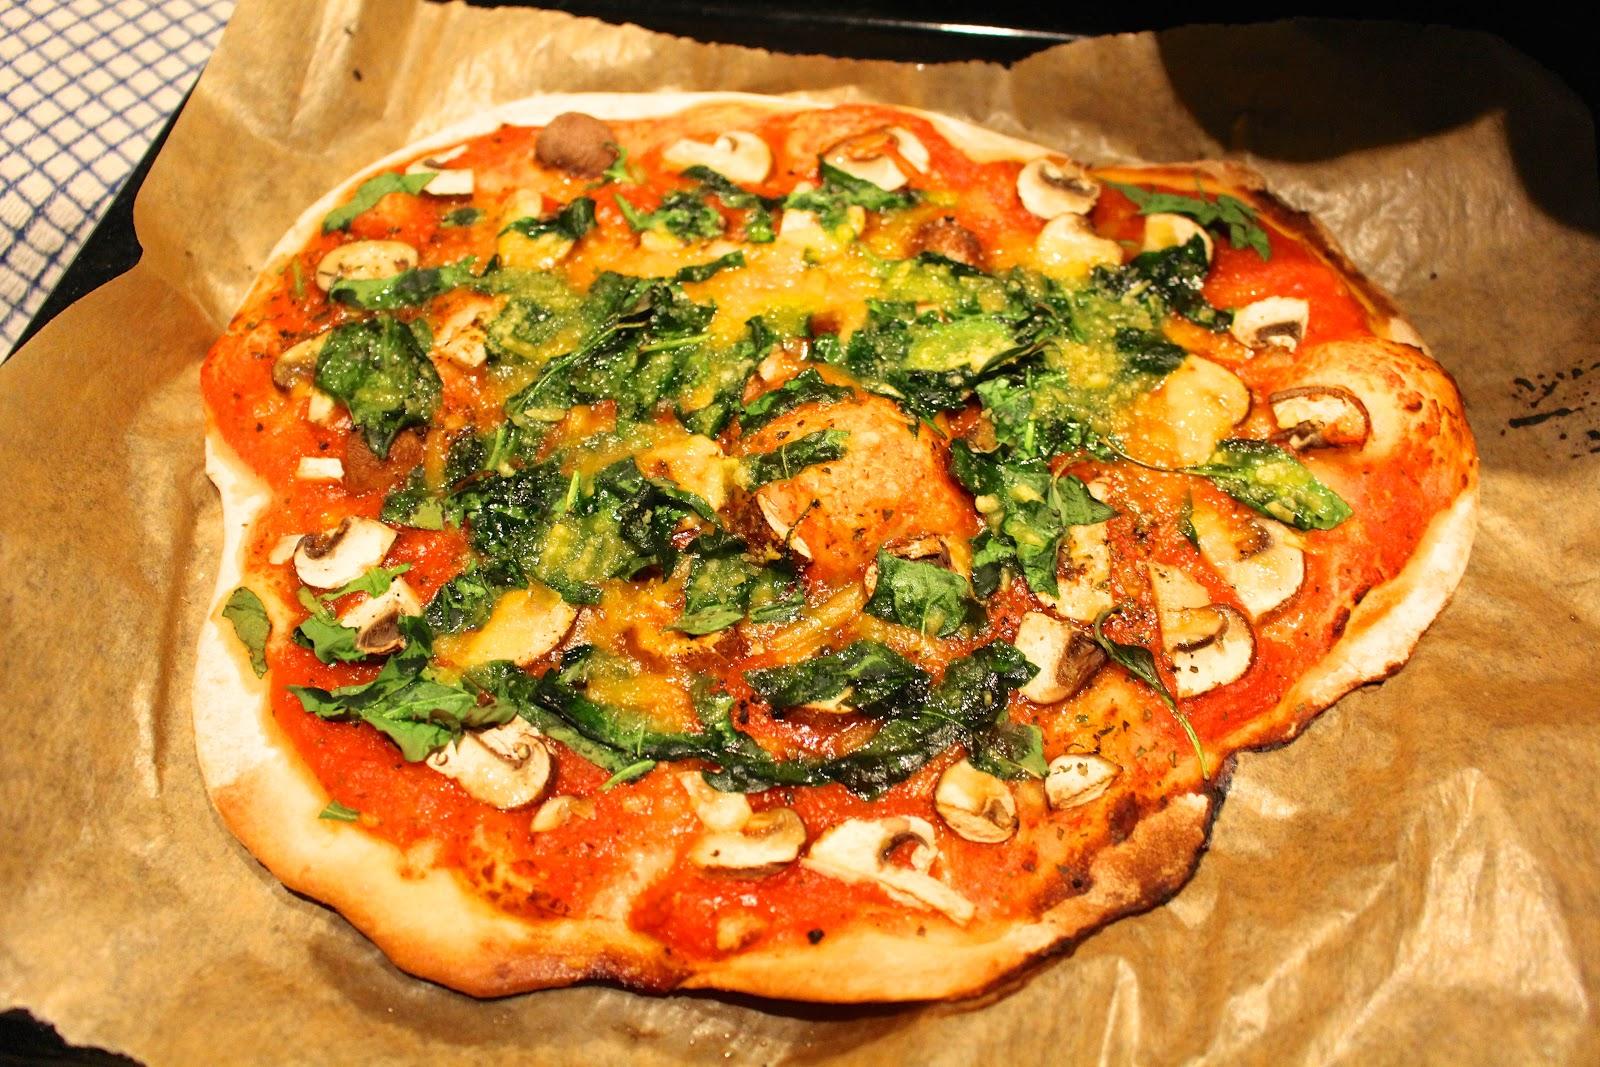 January vegan month   week 3. Vegan meal inspiration